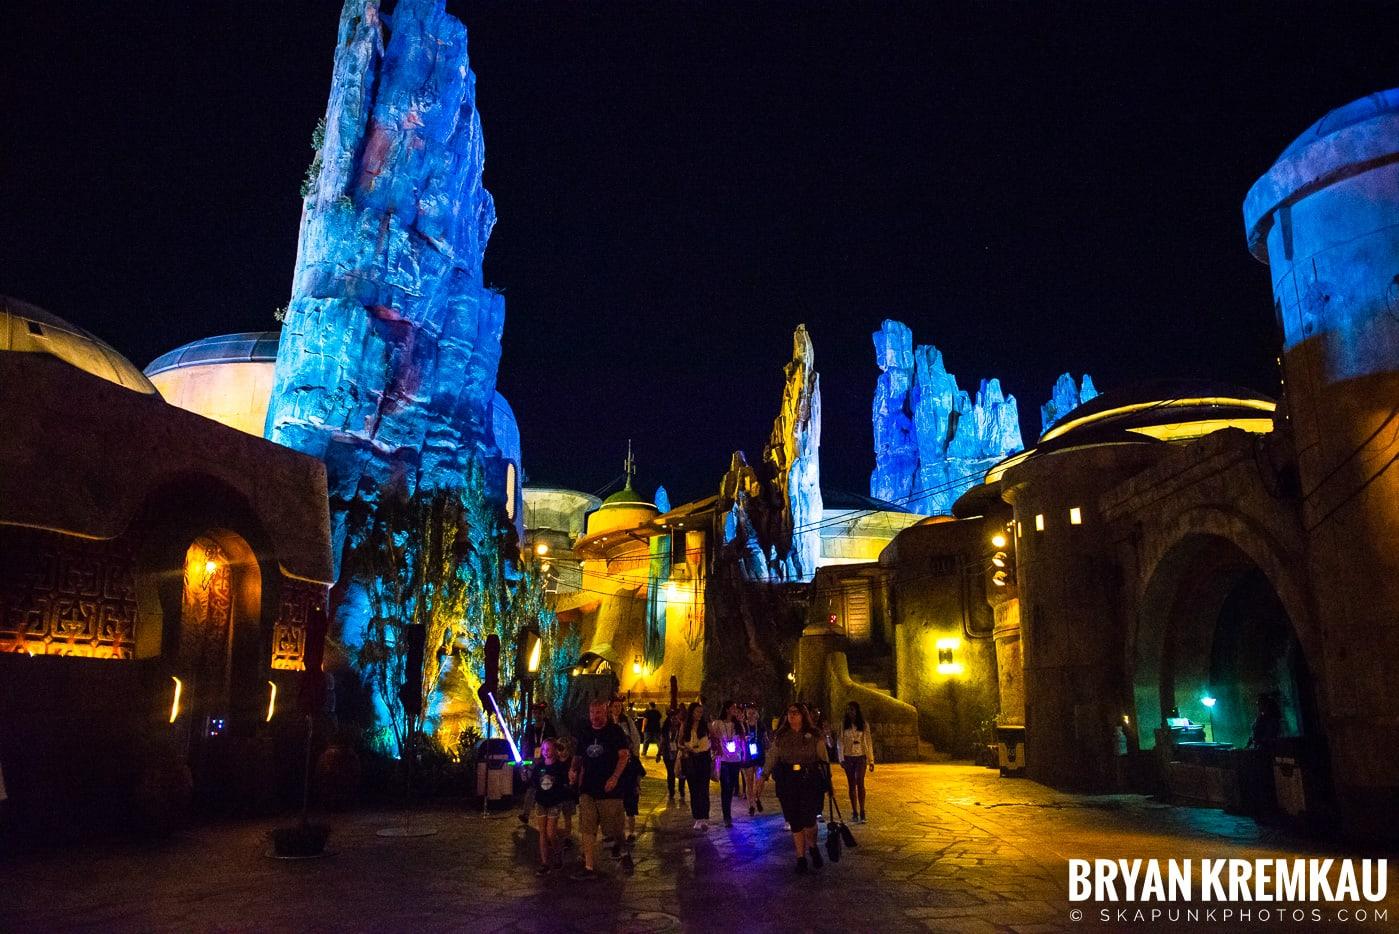 Walt Disney World Vacation: Day 5 (Animal Kingdom / Disney's Hollywood Studios) - 10.3.19 (7)